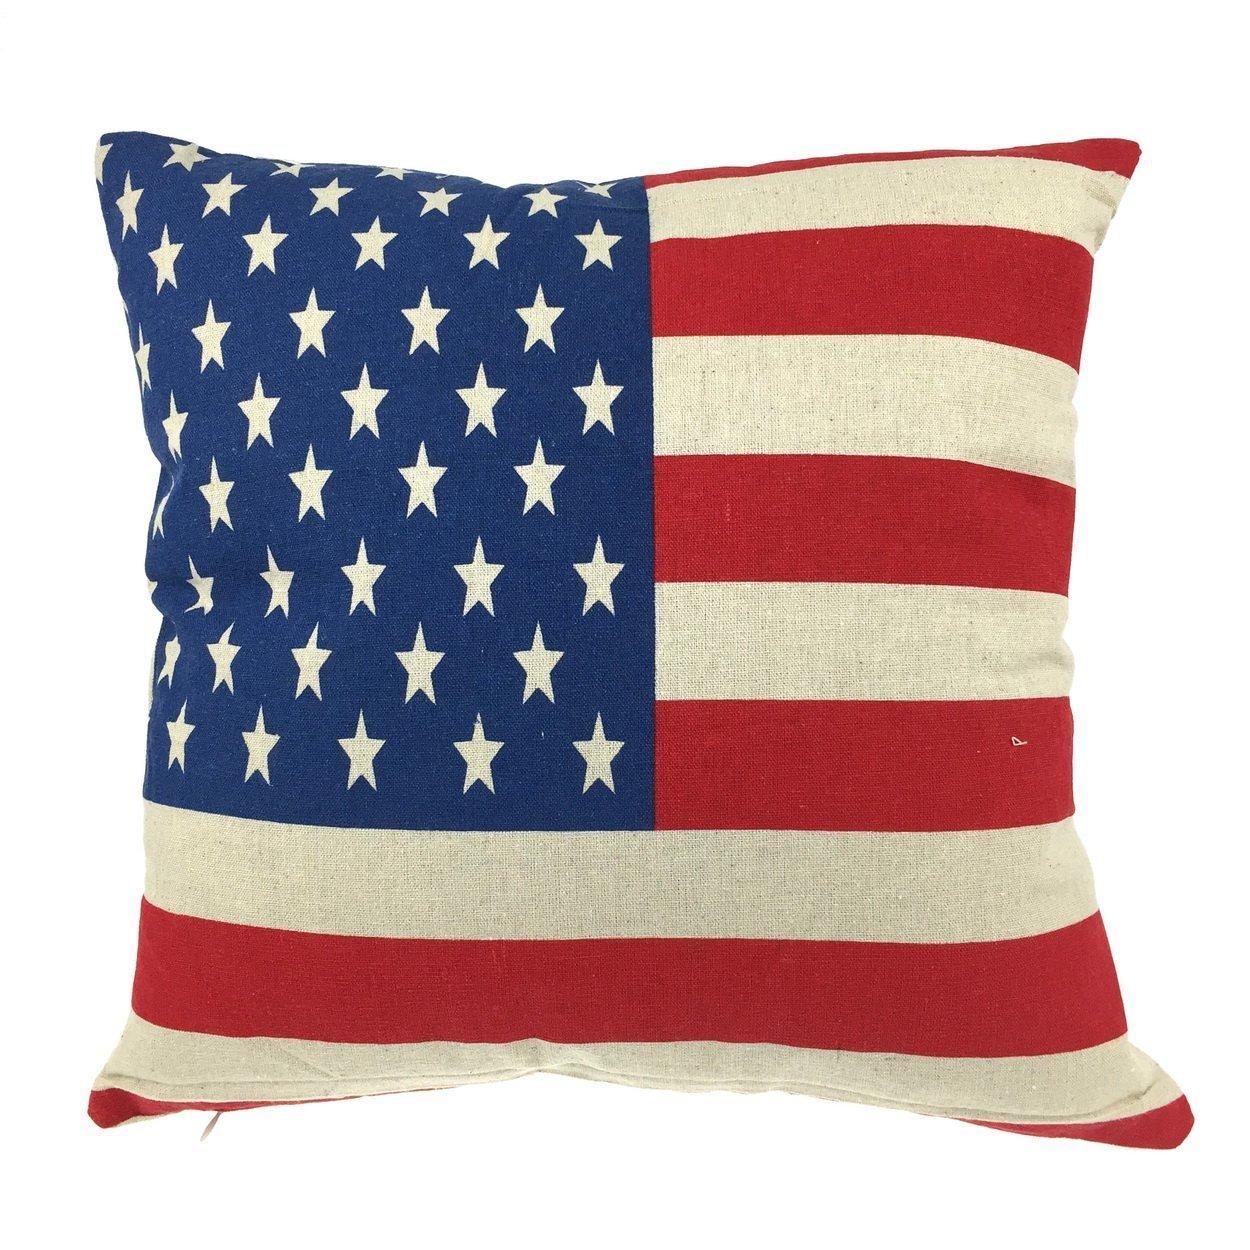 a53d92539d2a Get Quotations · Luxbon - Cotton Linen Vintage Style Flag Design Sofa Couch  Seat Throw Pillow Case Cushion Cover